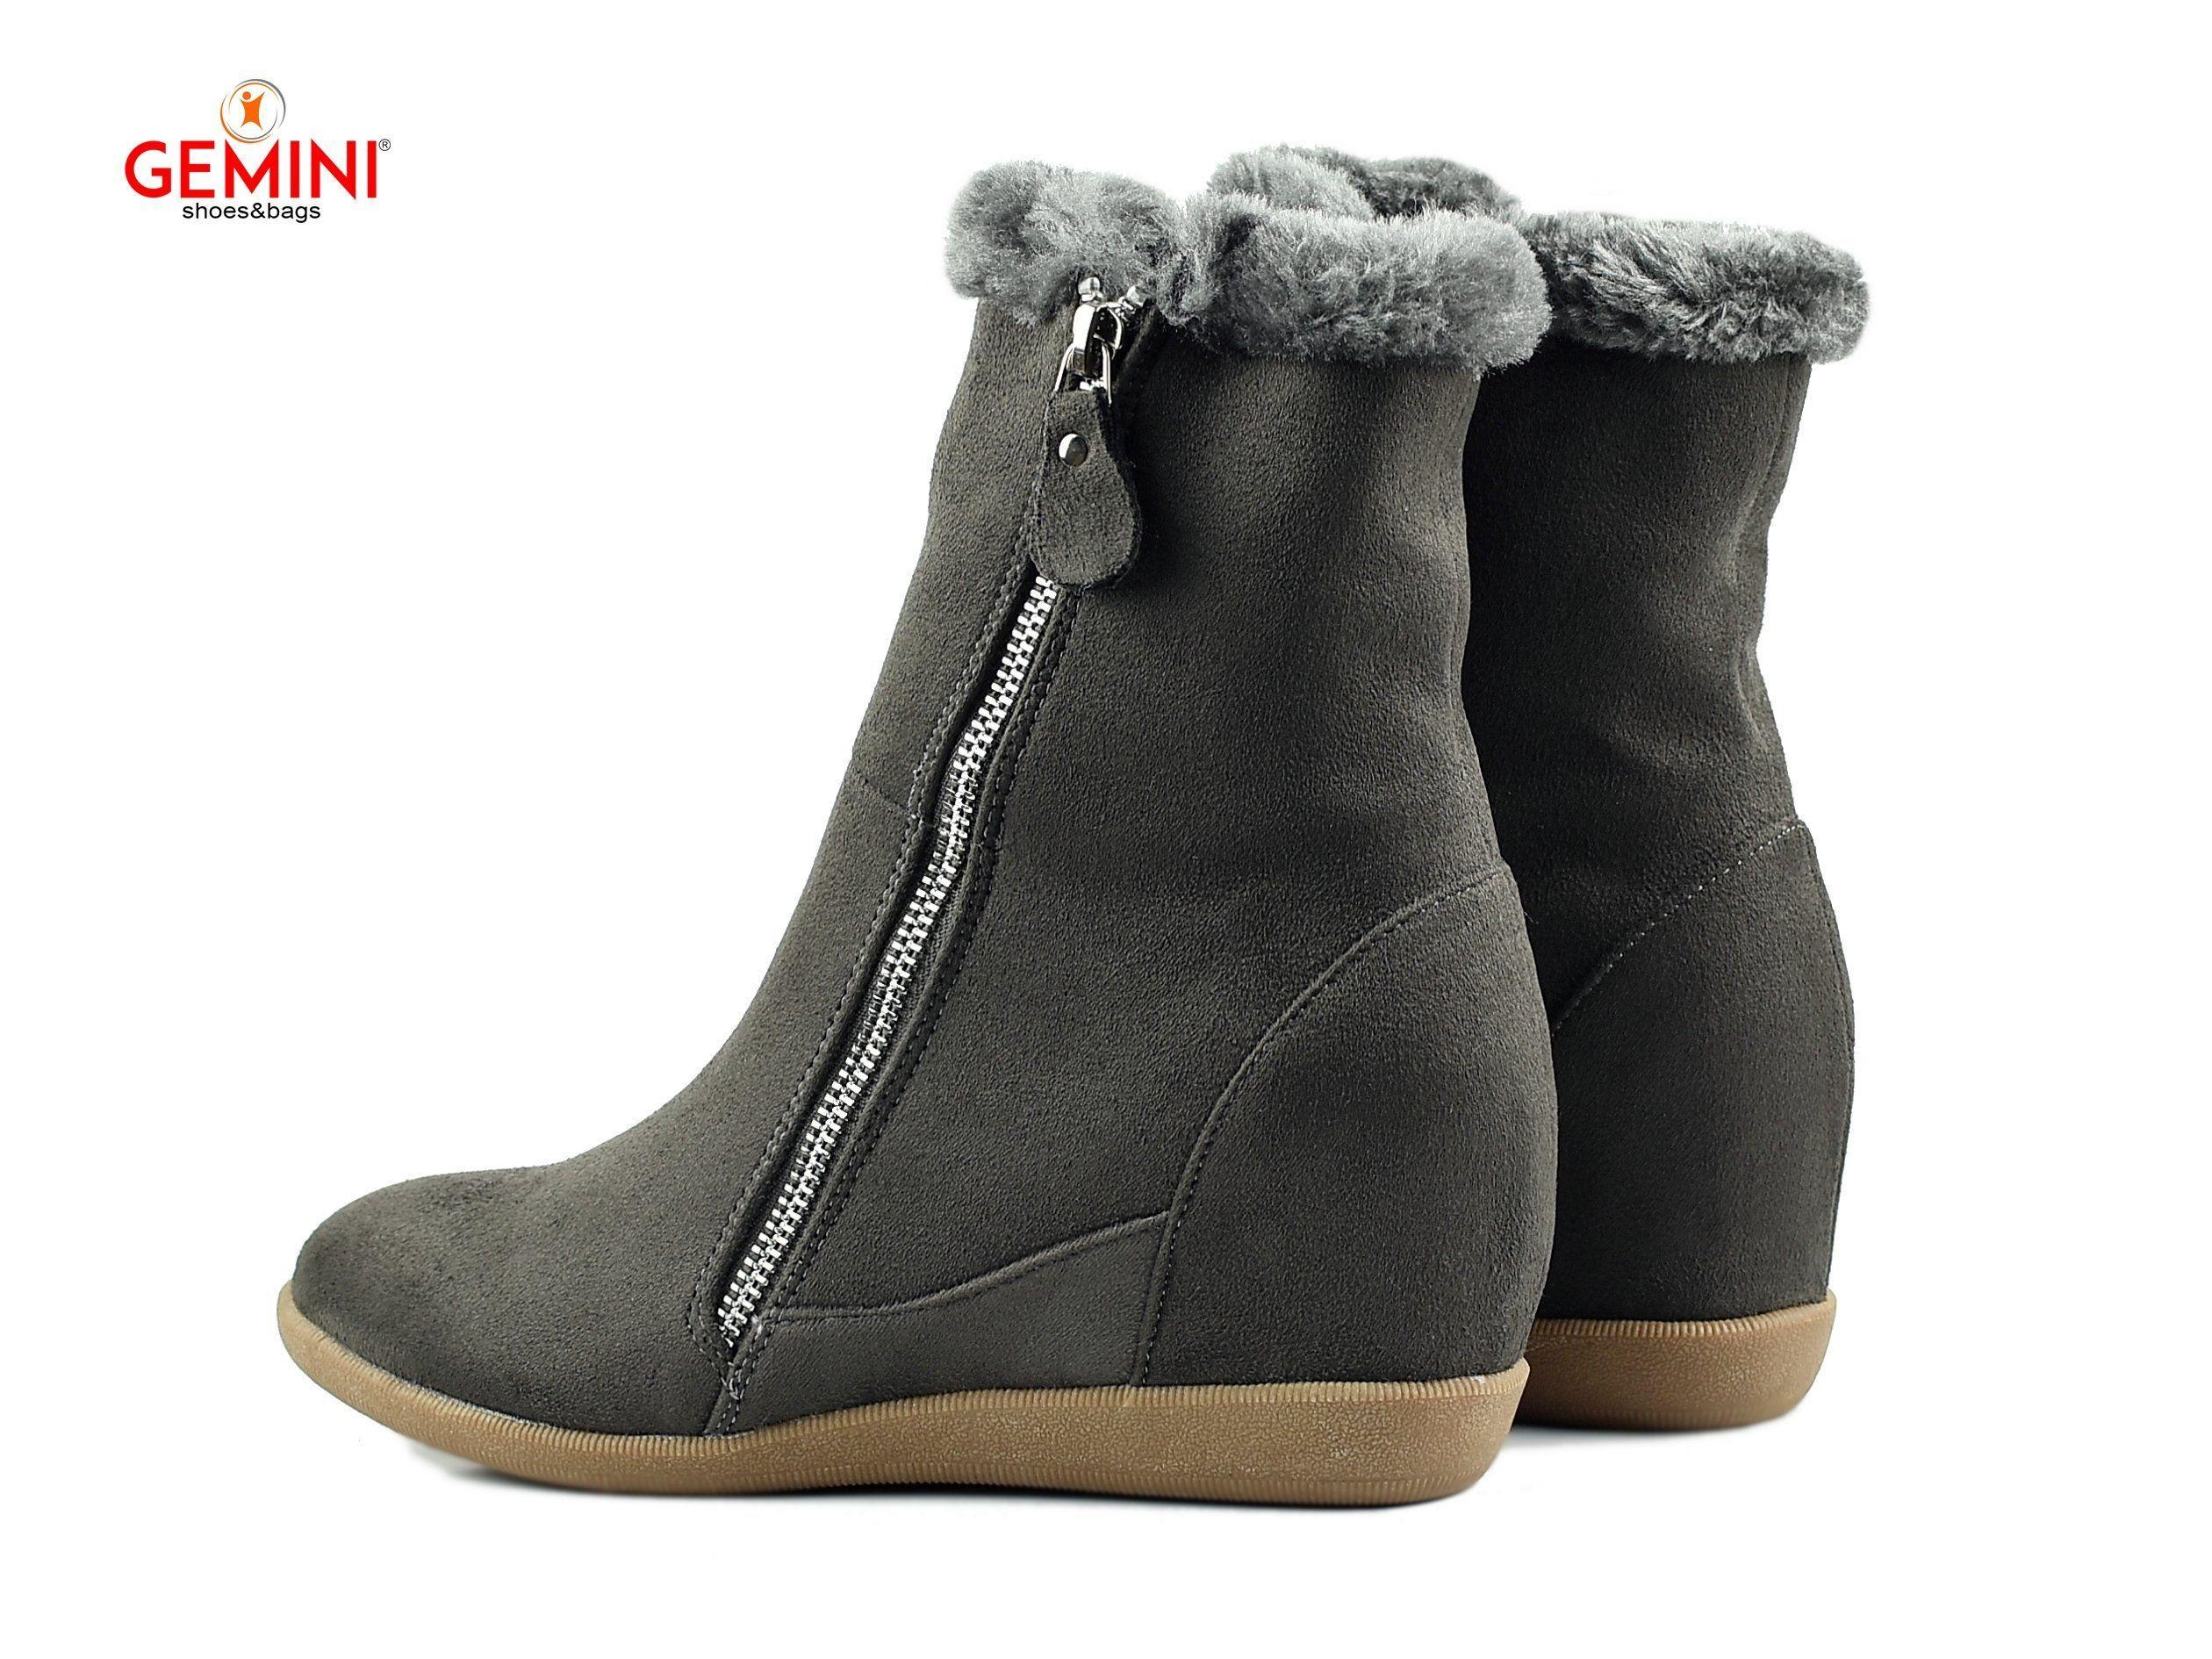 Monnari Botki Sneakersy Koturny Futerko Nowosc Boots Wedge Sneaker Shoes